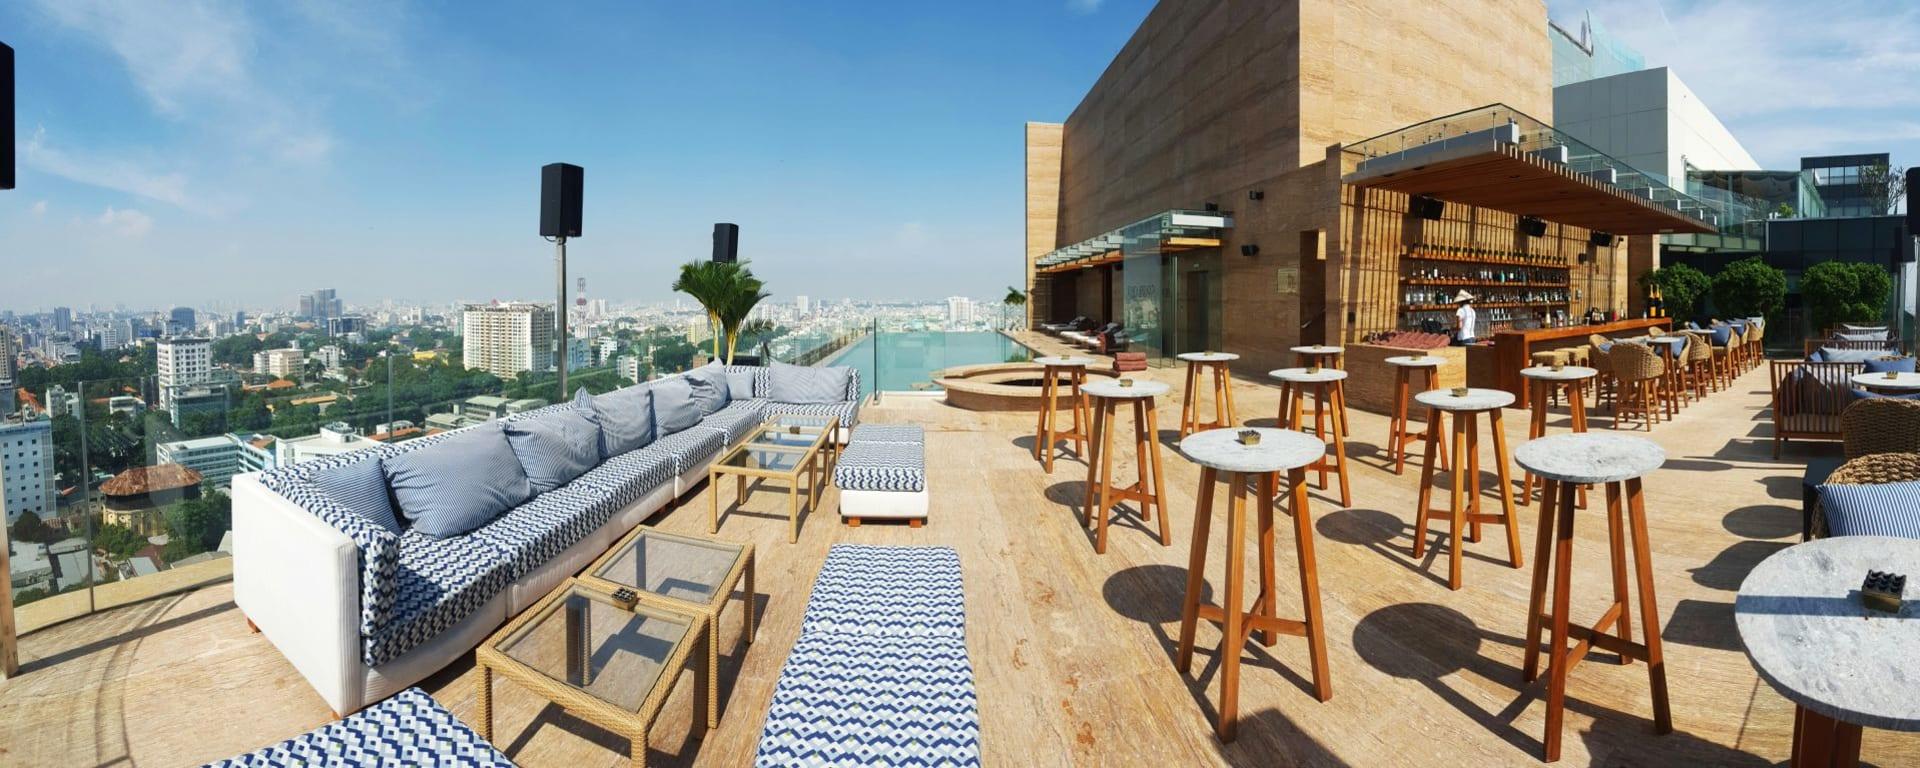 Hôtel des Arts Saigon: Pool Bar